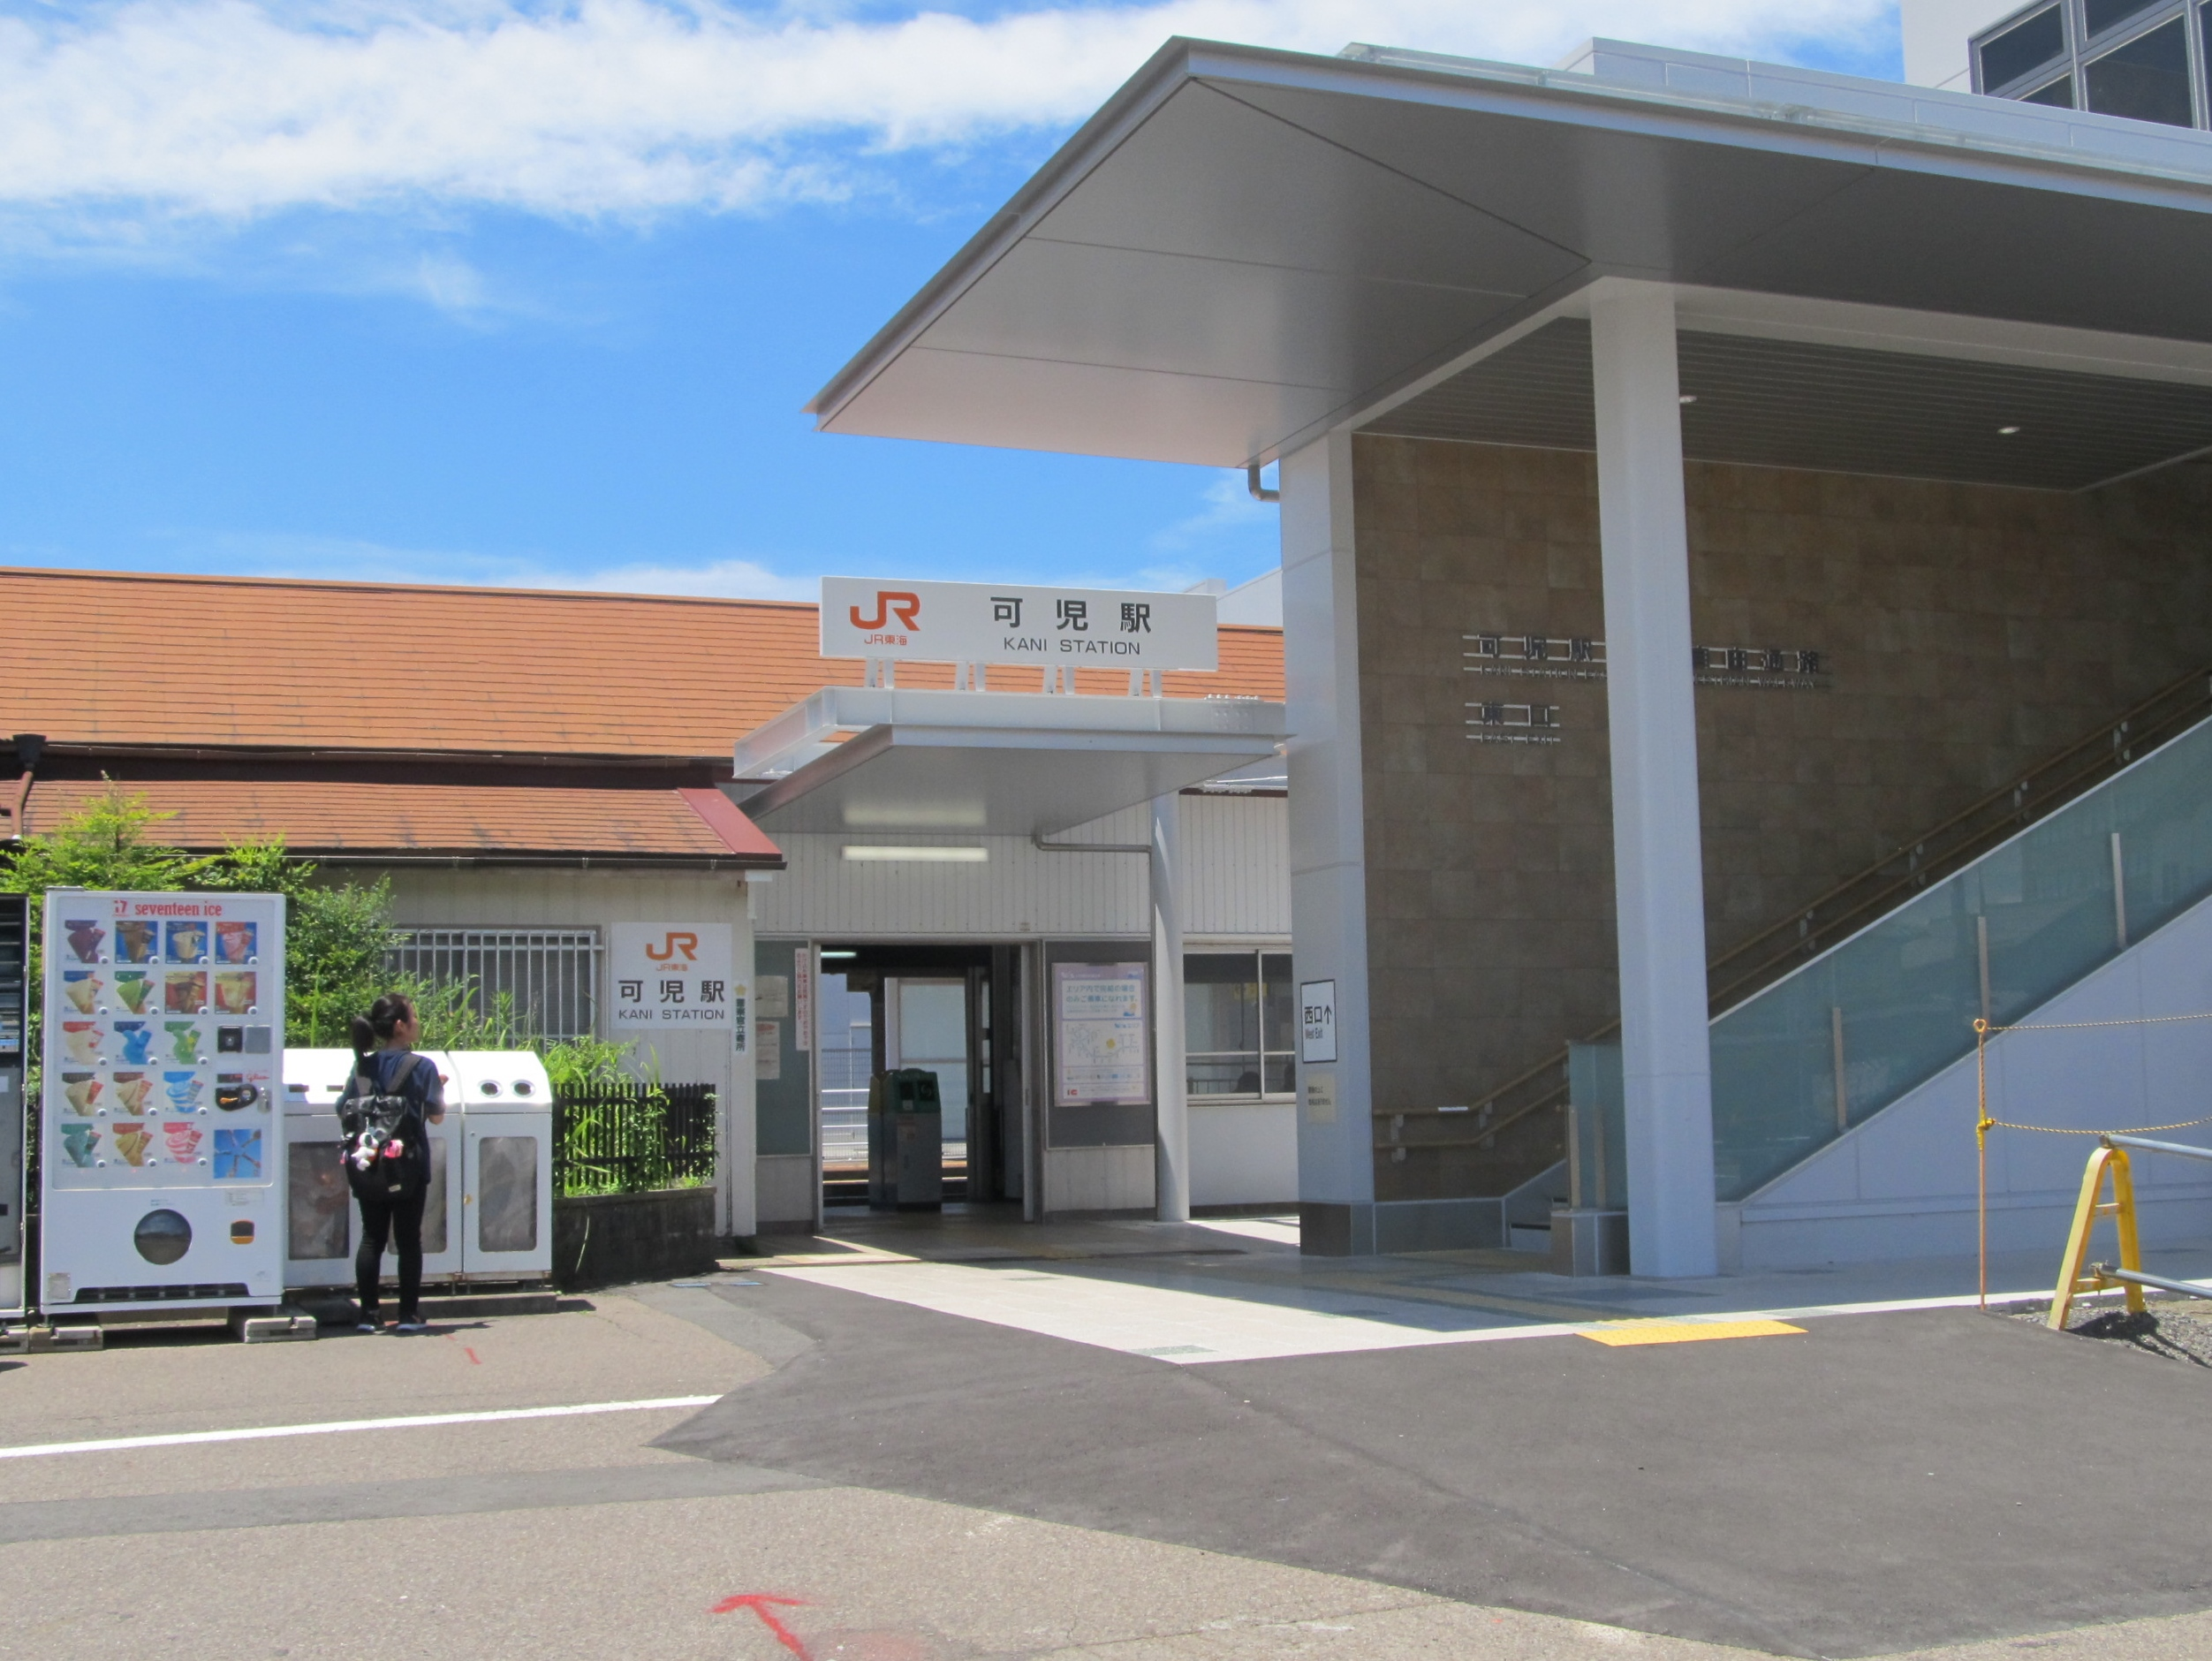 可児駅 - Wikipedia